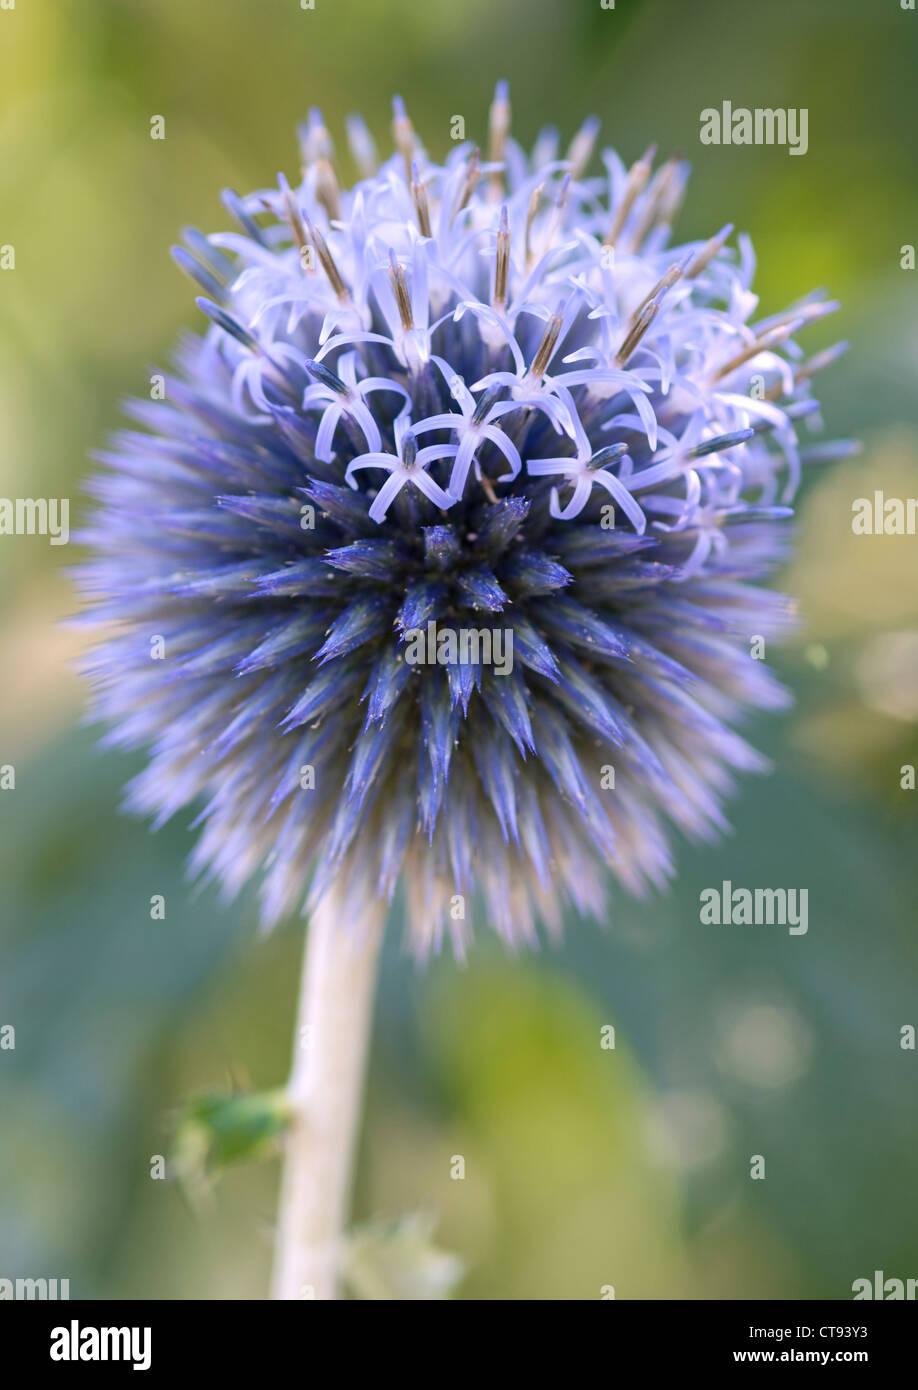 Echinops bannaticus 'Taplow blue', Globe thistle. Blue flower. - Stock Image